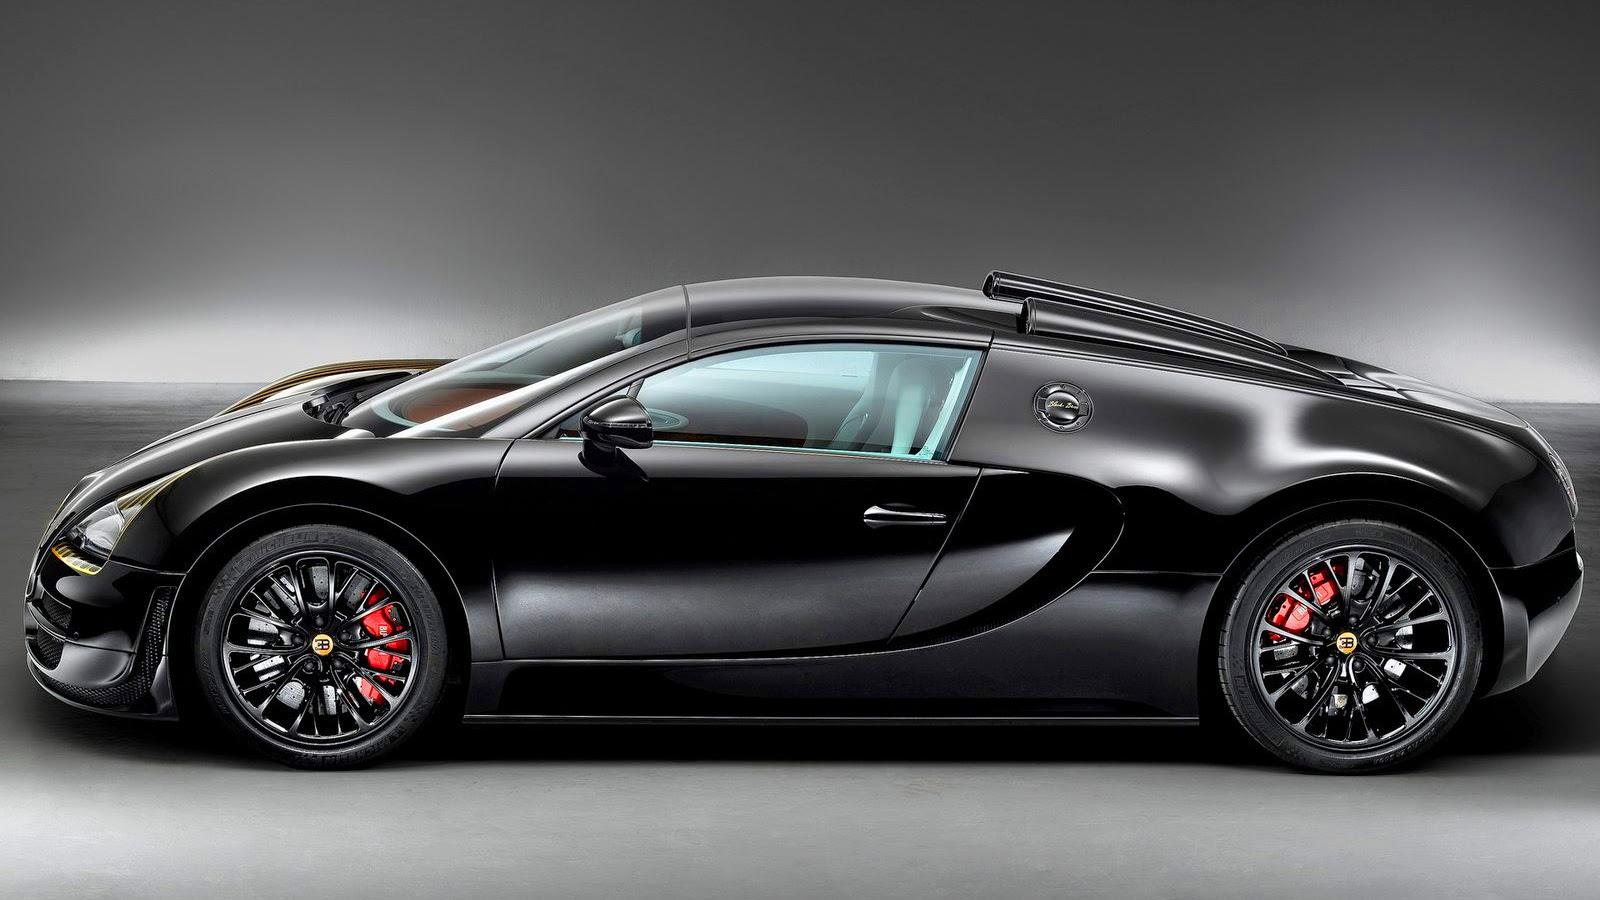 2014 bugatti veyron grand sport vitesse black bess 2014 bugatti veyron grand sport vitesse. Black Bedroom Furniture Sets. Home Design Ideas